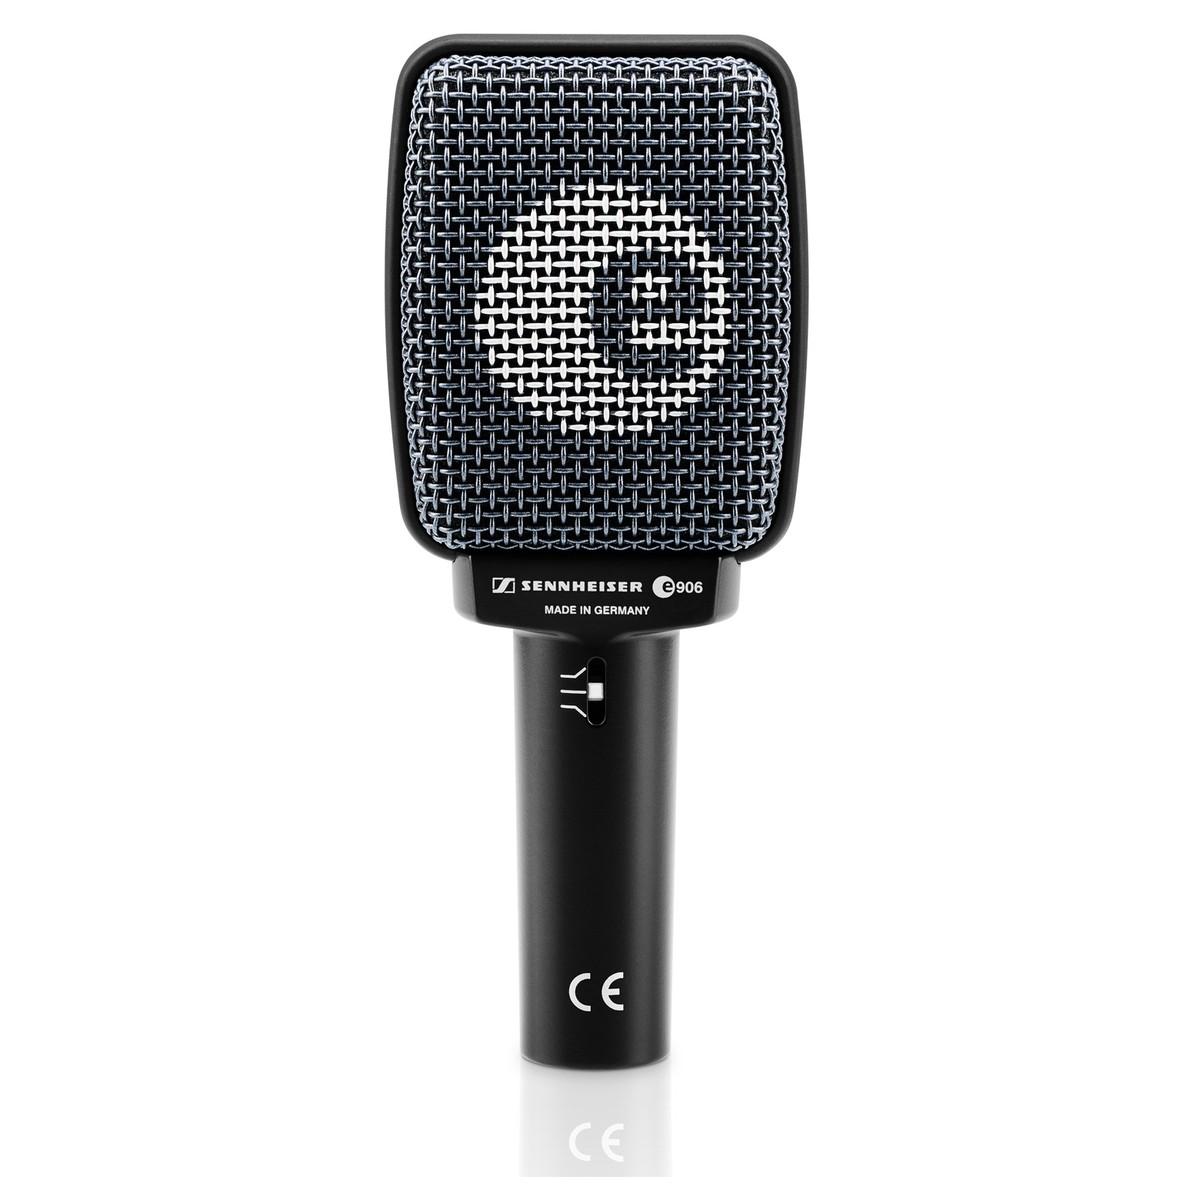 sennheiser e906 dynamic instrument microphone at gear4music. Black Bedroom Furniture Sets. Home Design Ideas